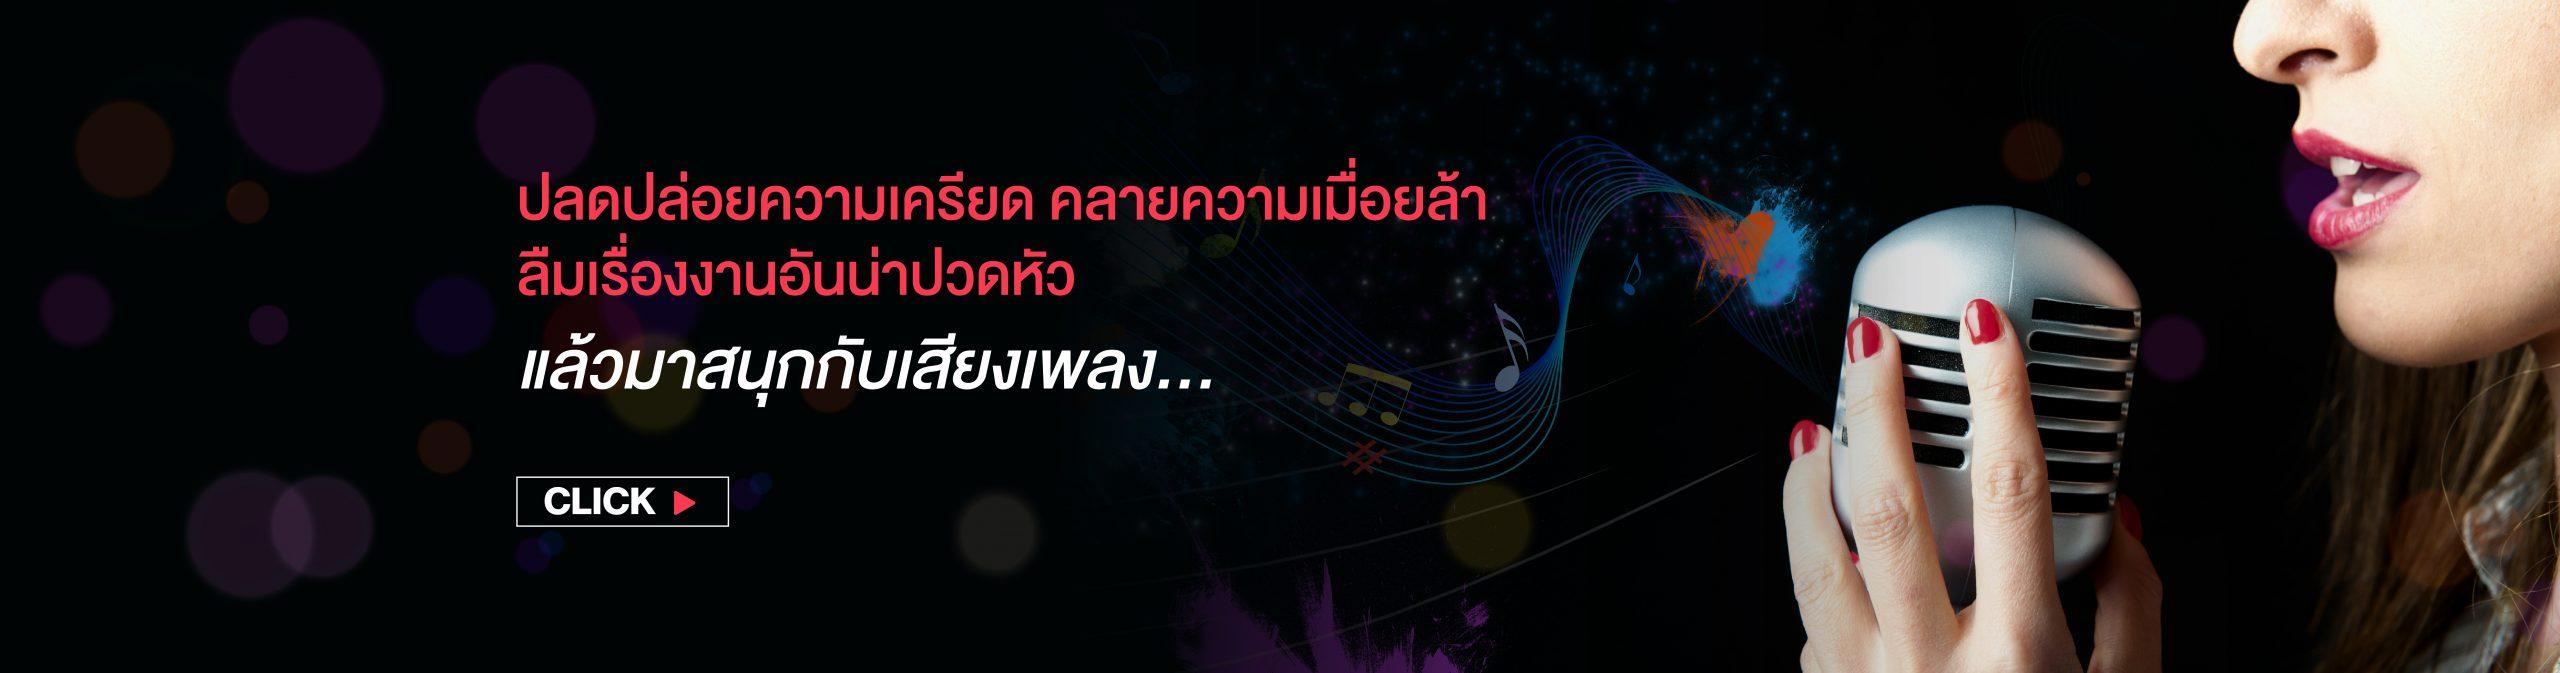 Karaoke-01-1